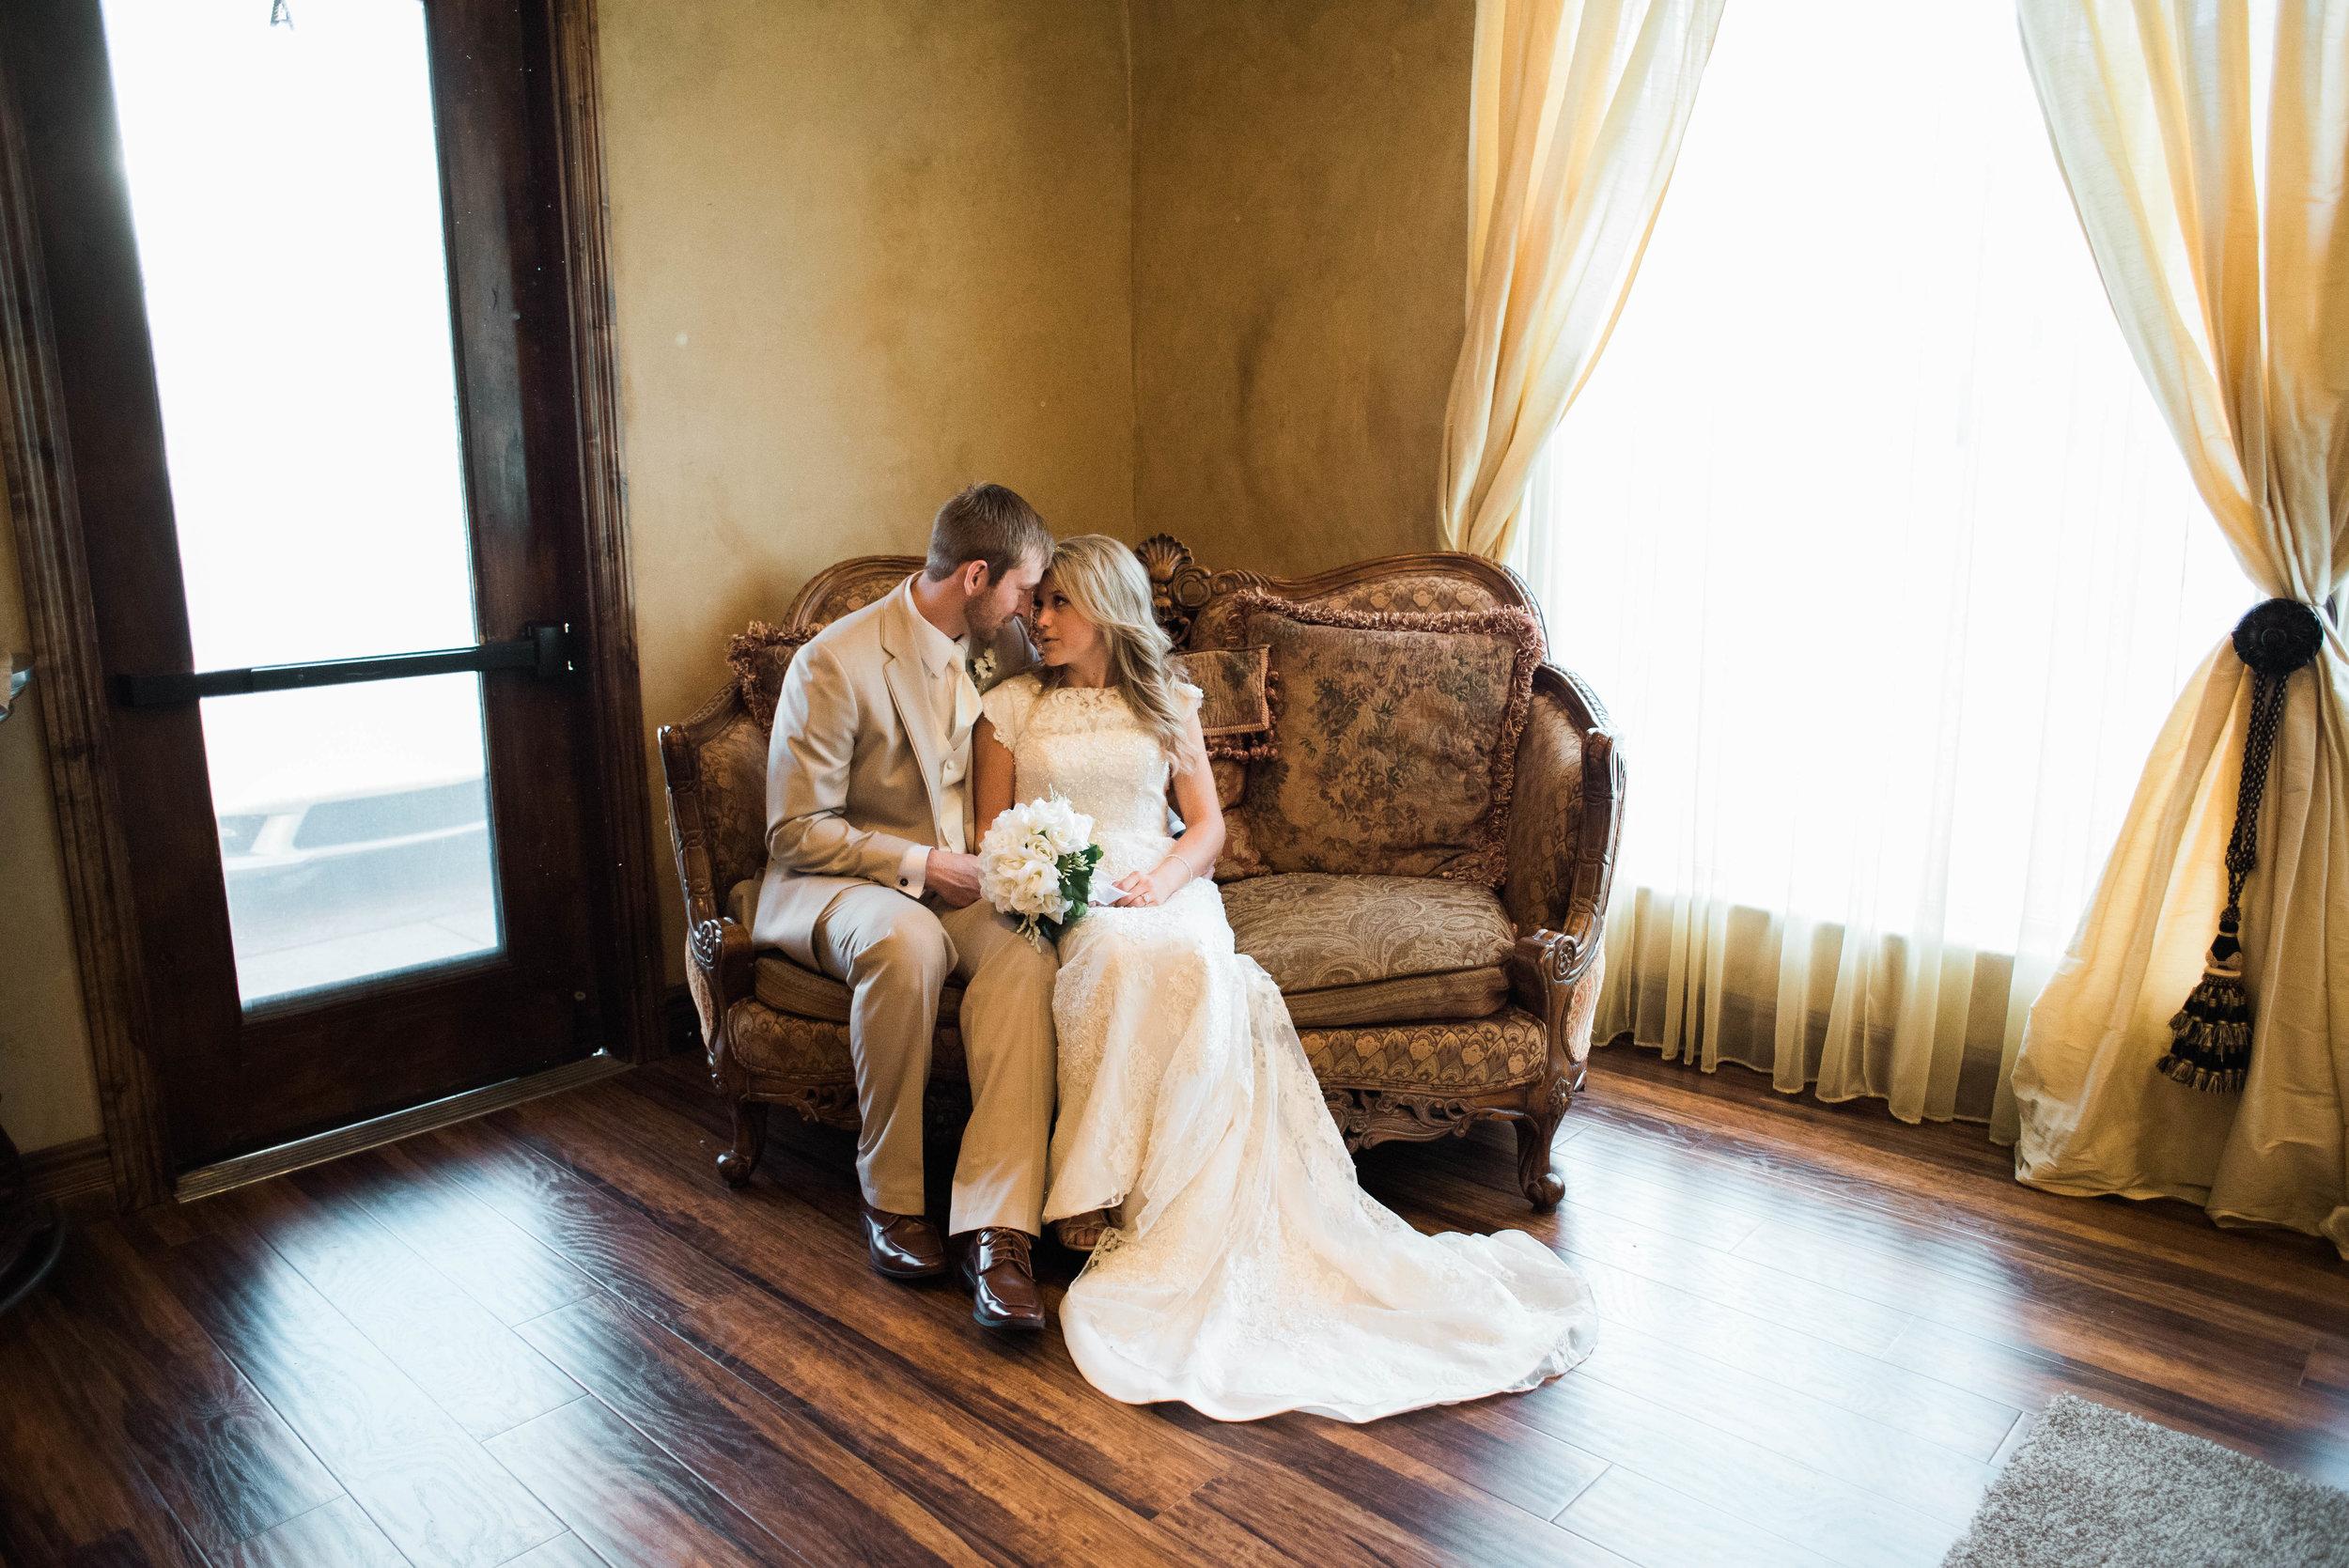 DANIEL+LACI-WEDDING-Sadie_Banks_Photography-415.jpg